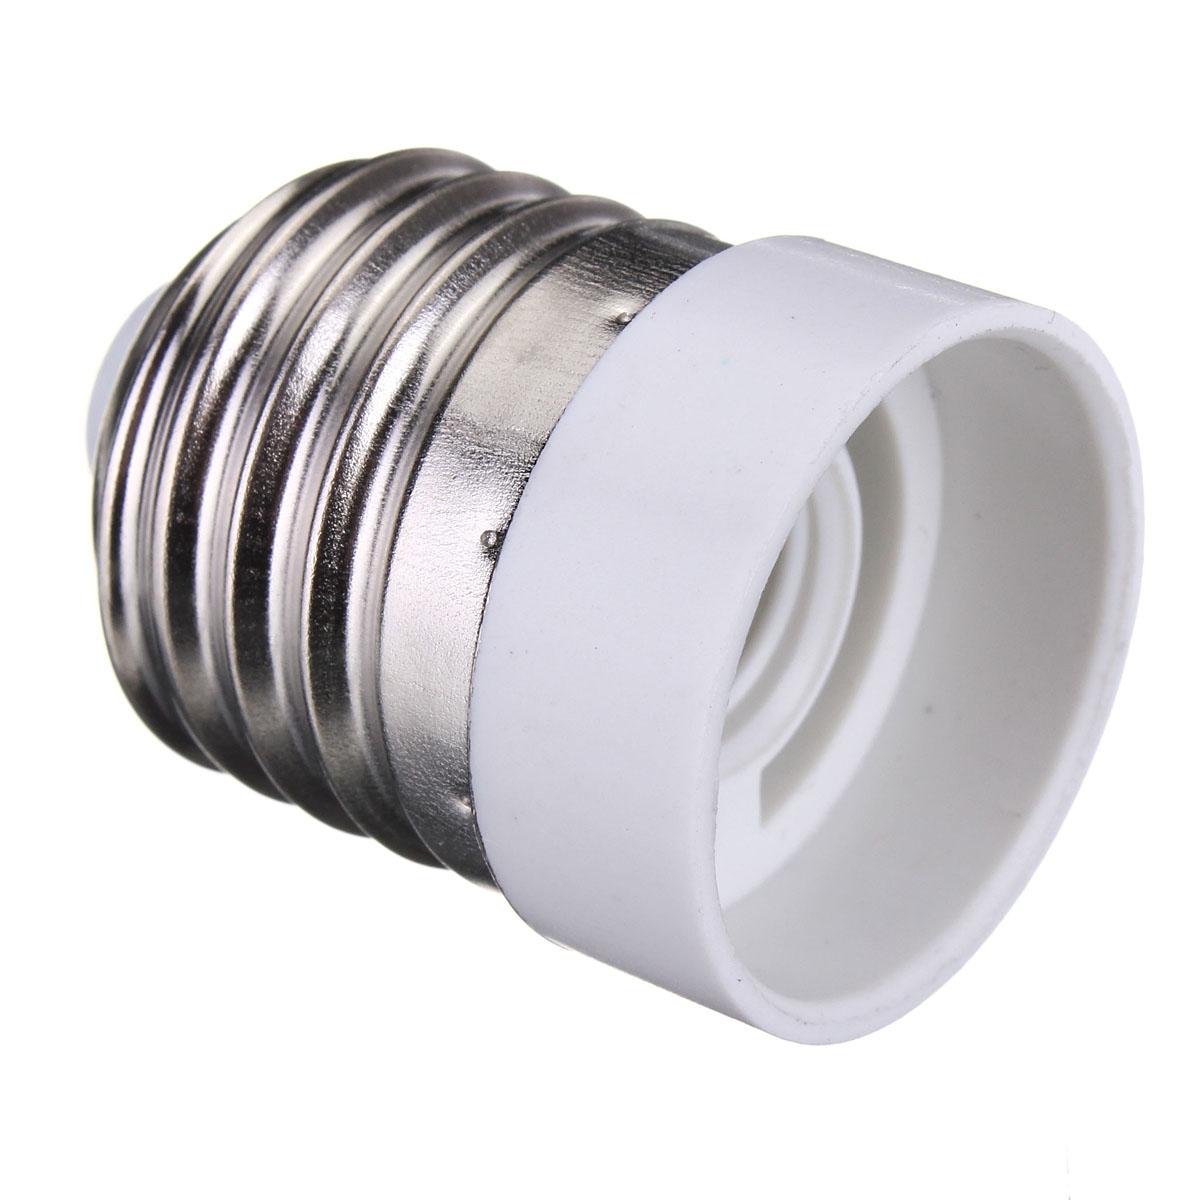 E26 to e12 base led light lamp bulb screw adapter E12 light bulb